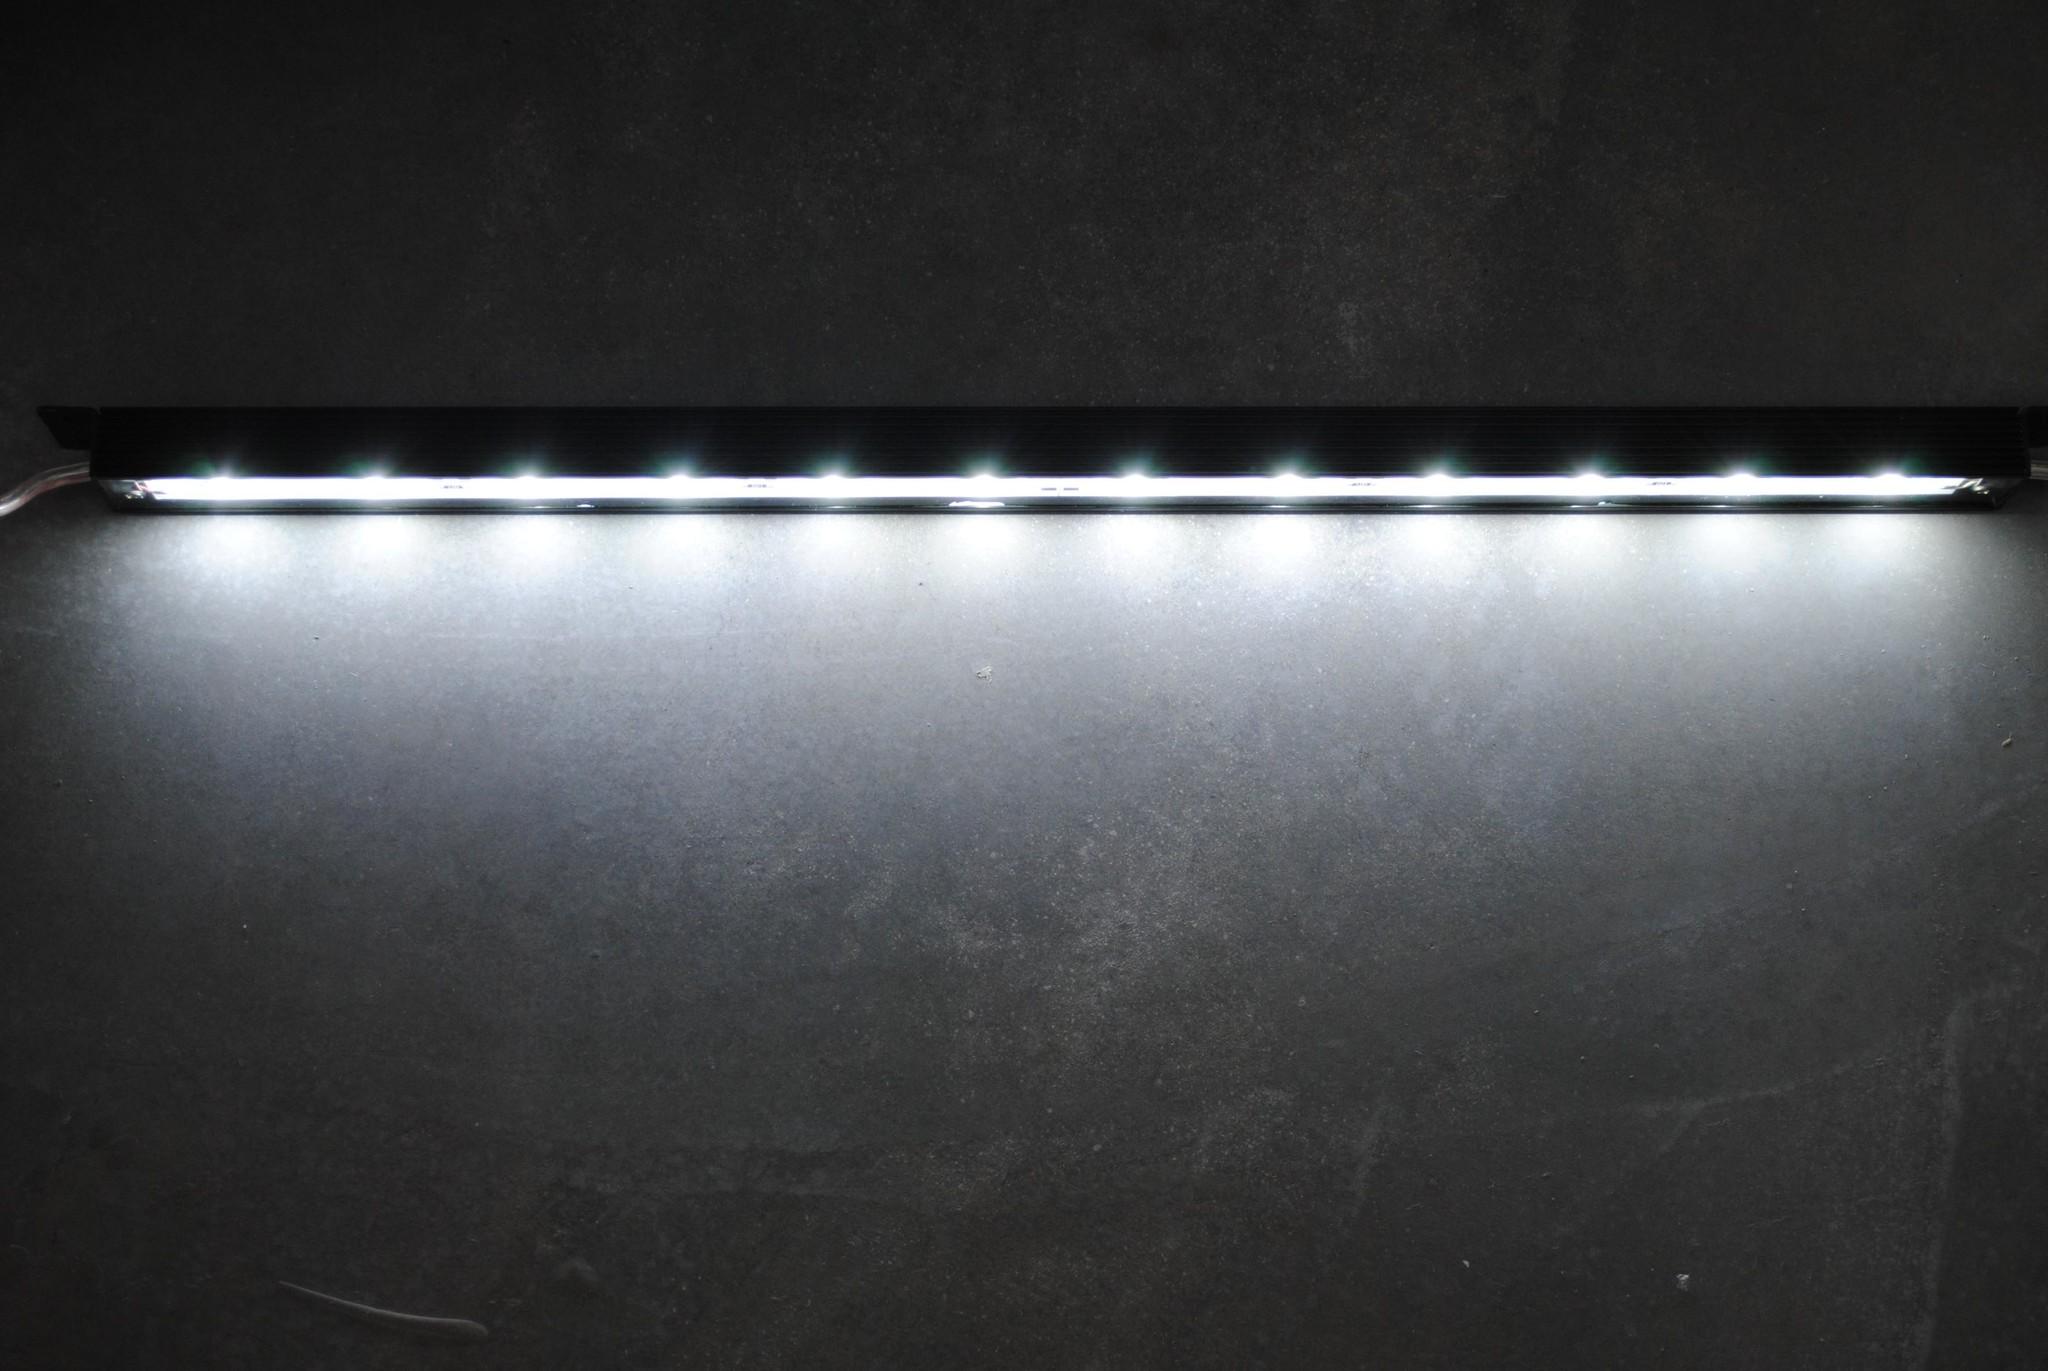 LEDBAR PRO de 50 cm - Blanc IP68 étanche 12W 24V